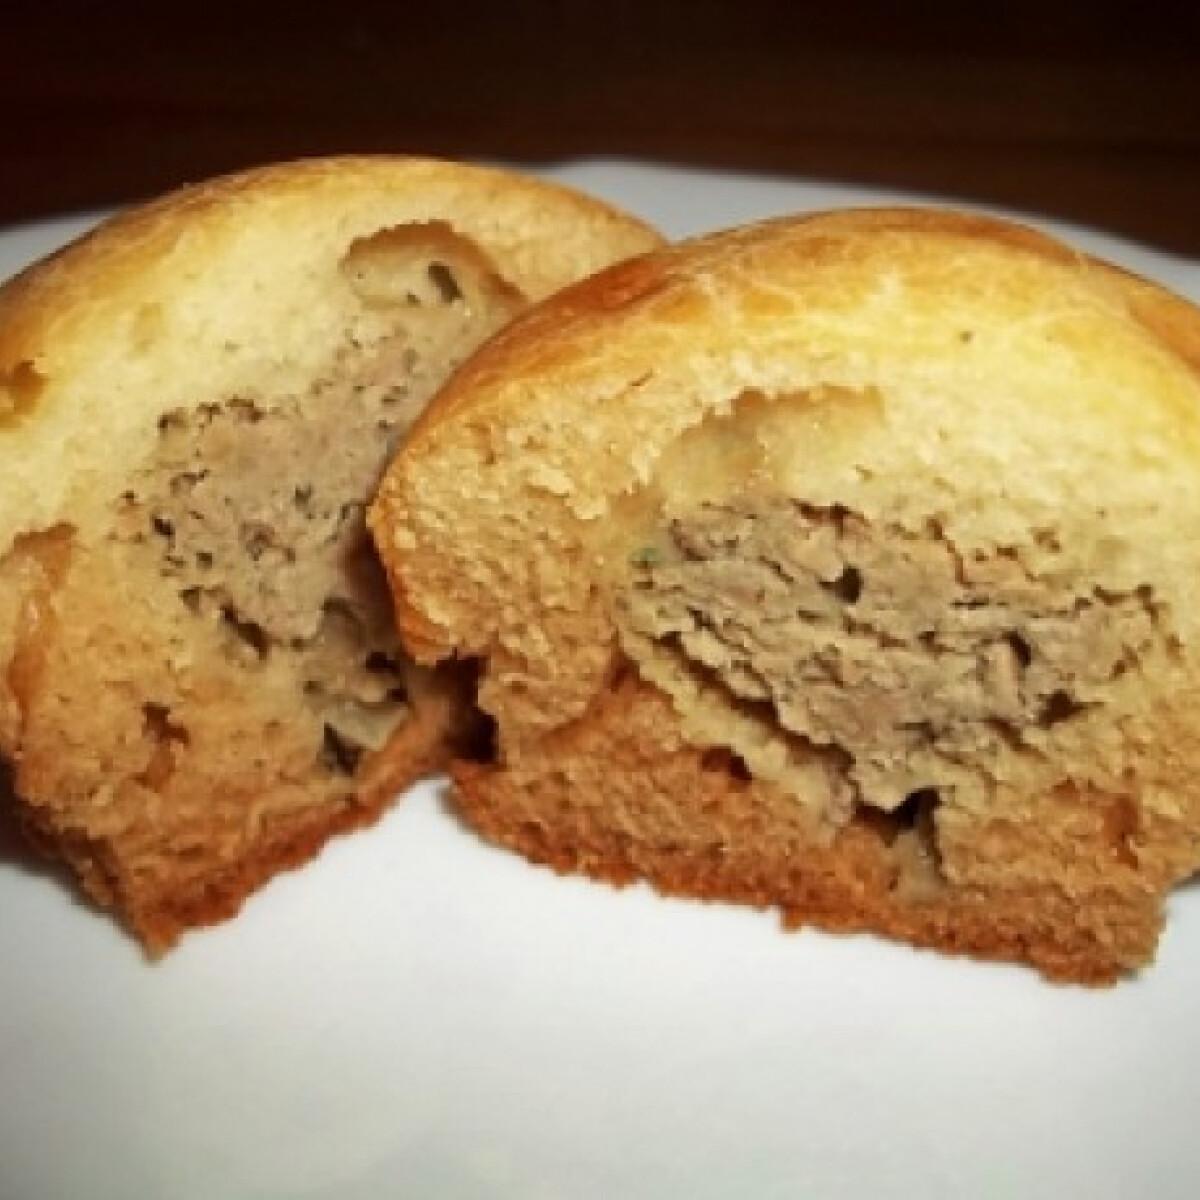 Csirkemájjal töltött muffin